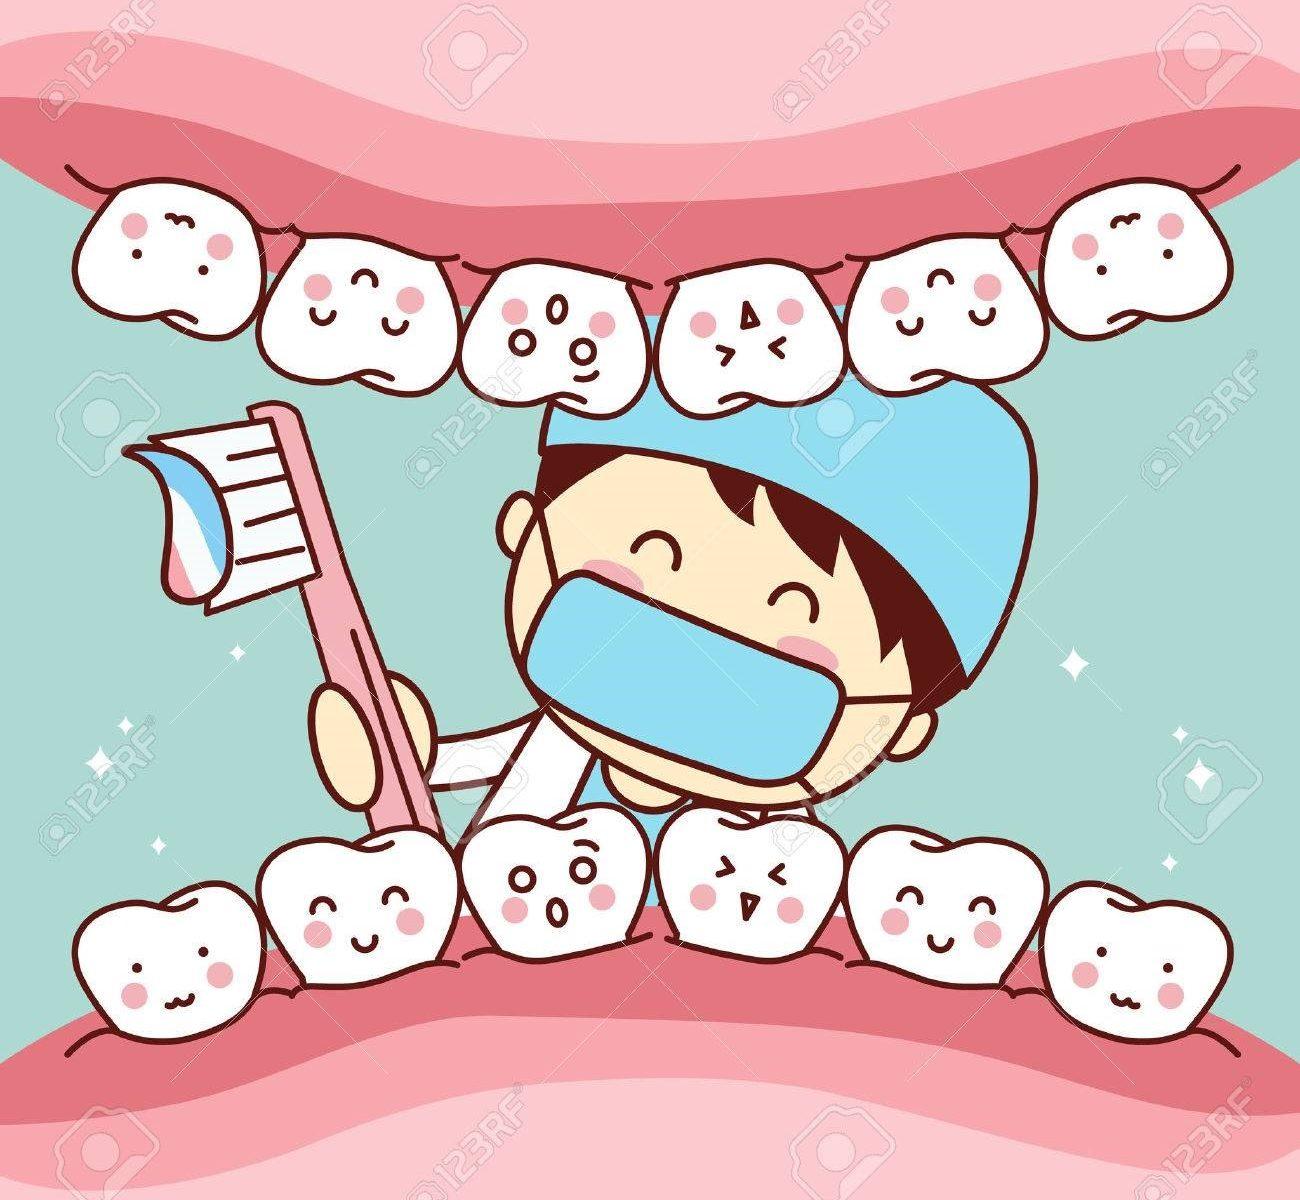 Somos dental cleaning